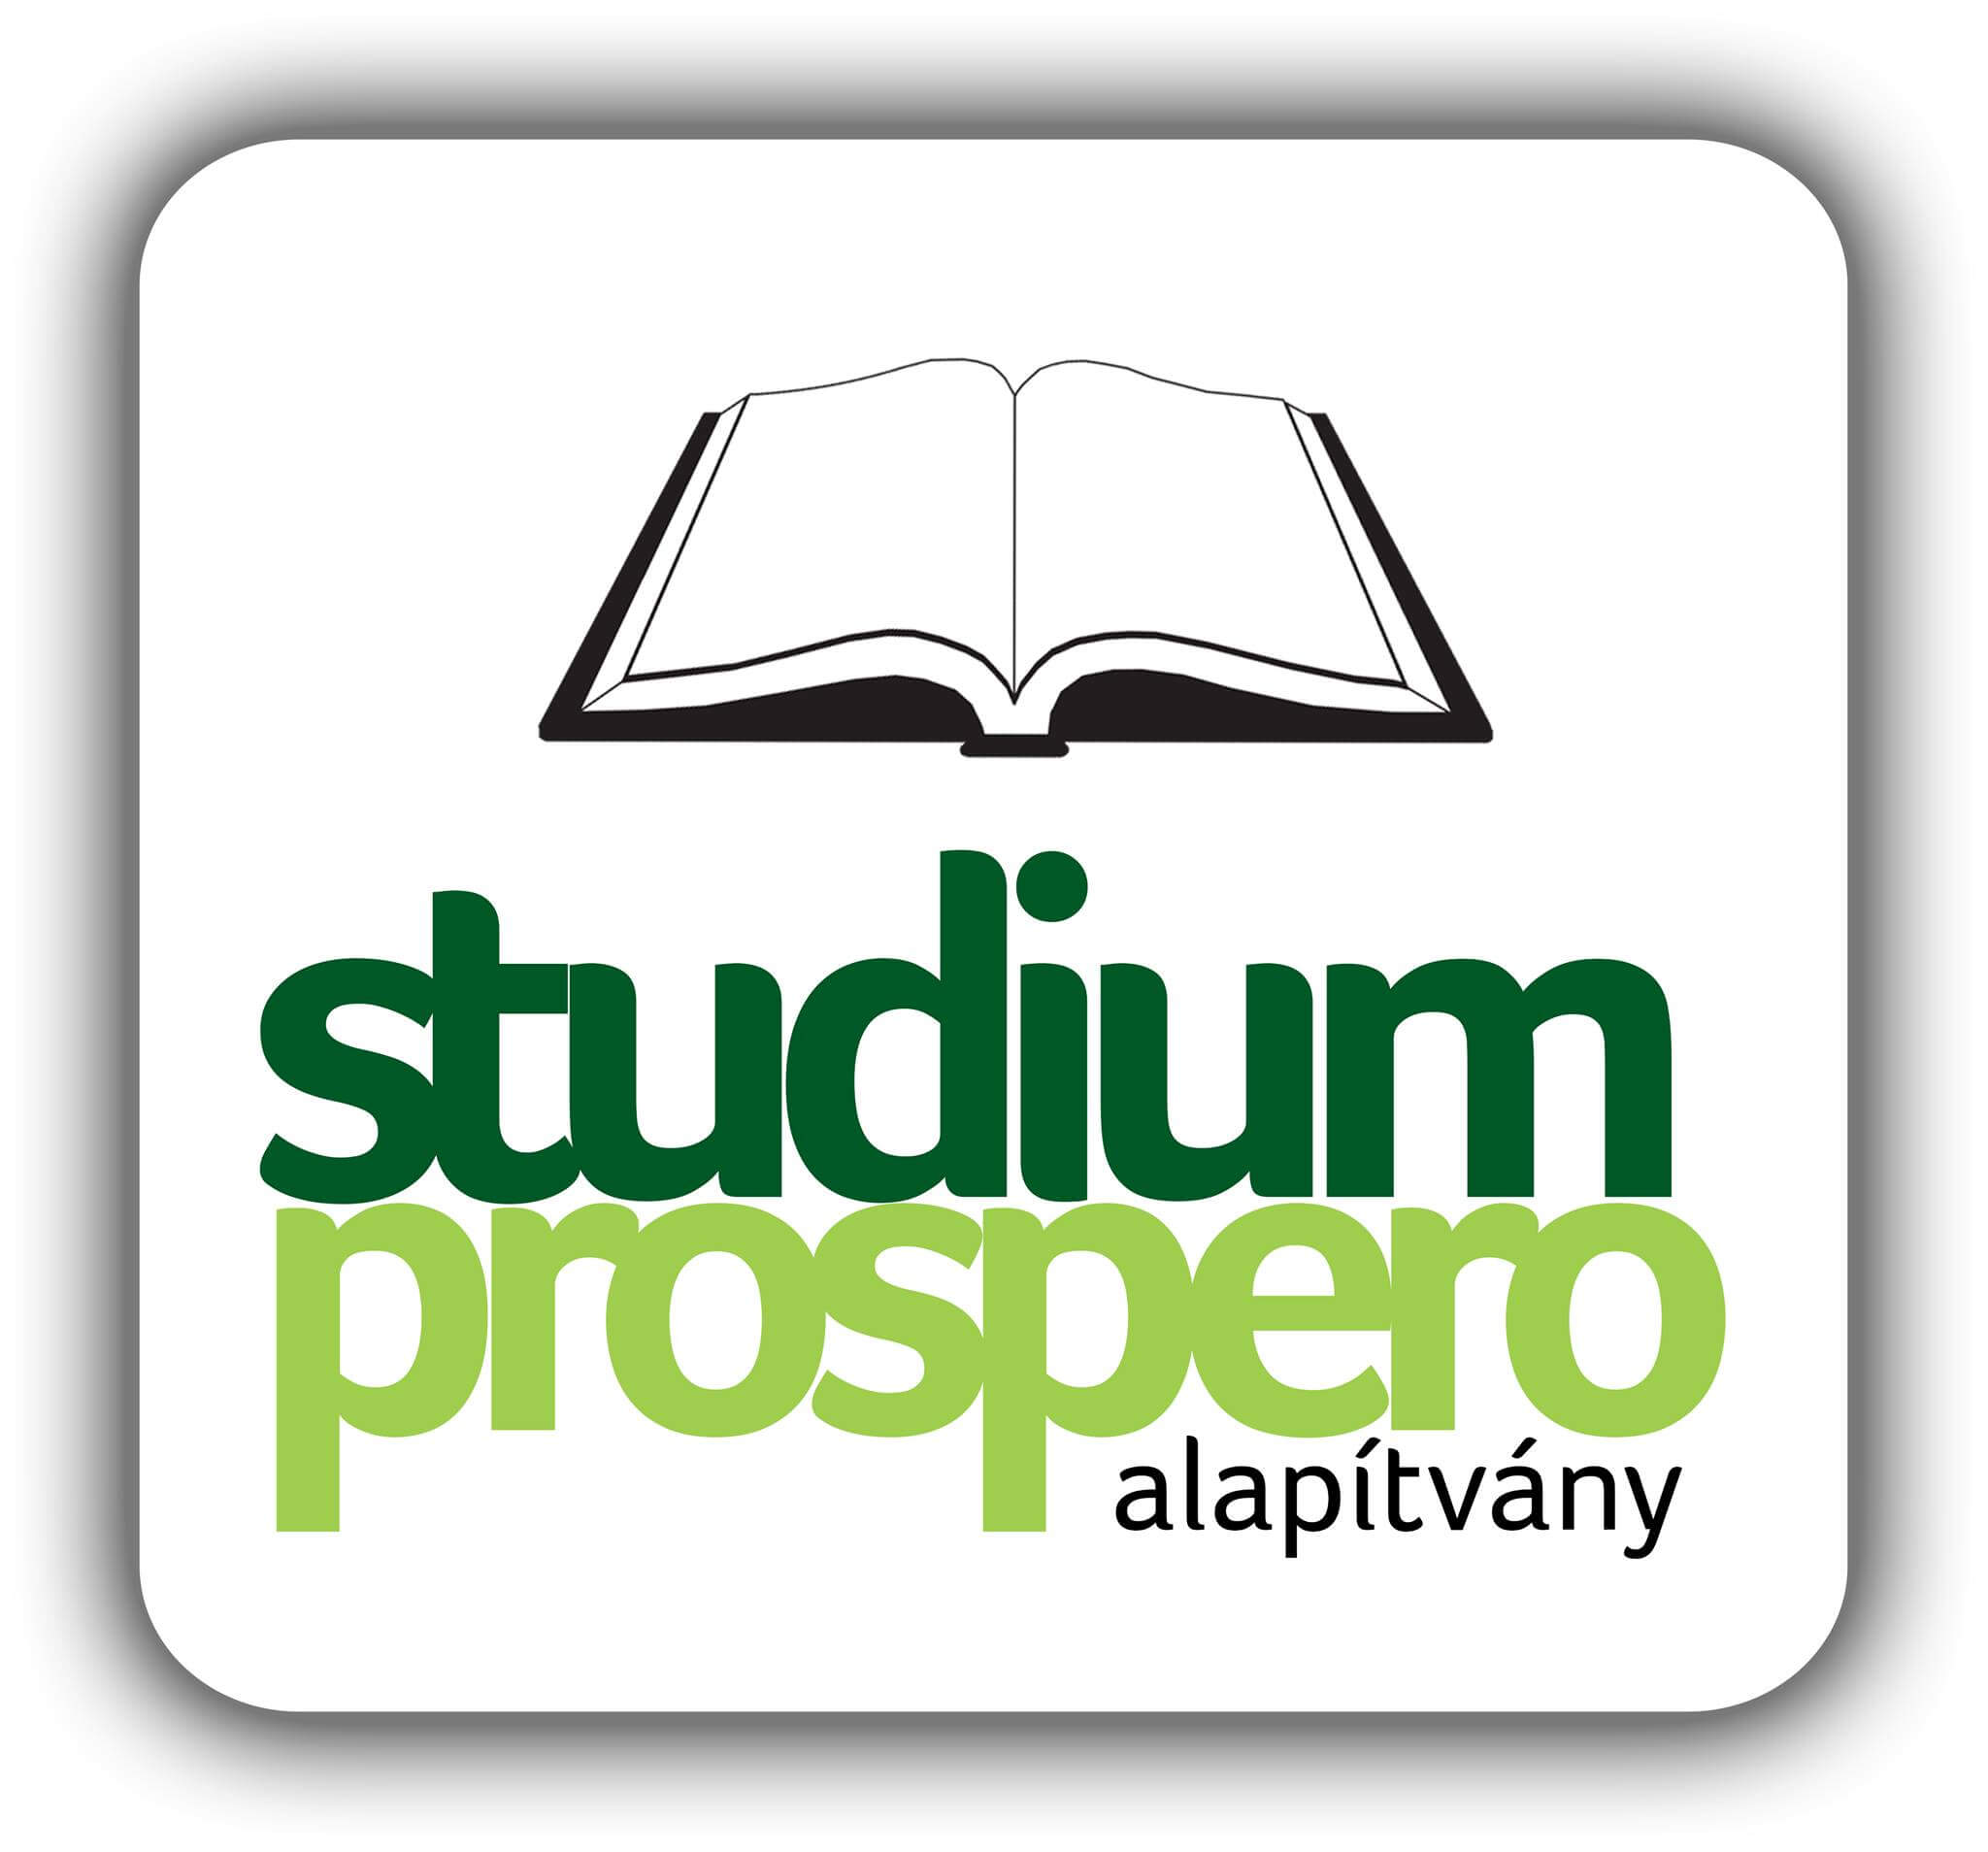 Studium Prospero Alapítvány